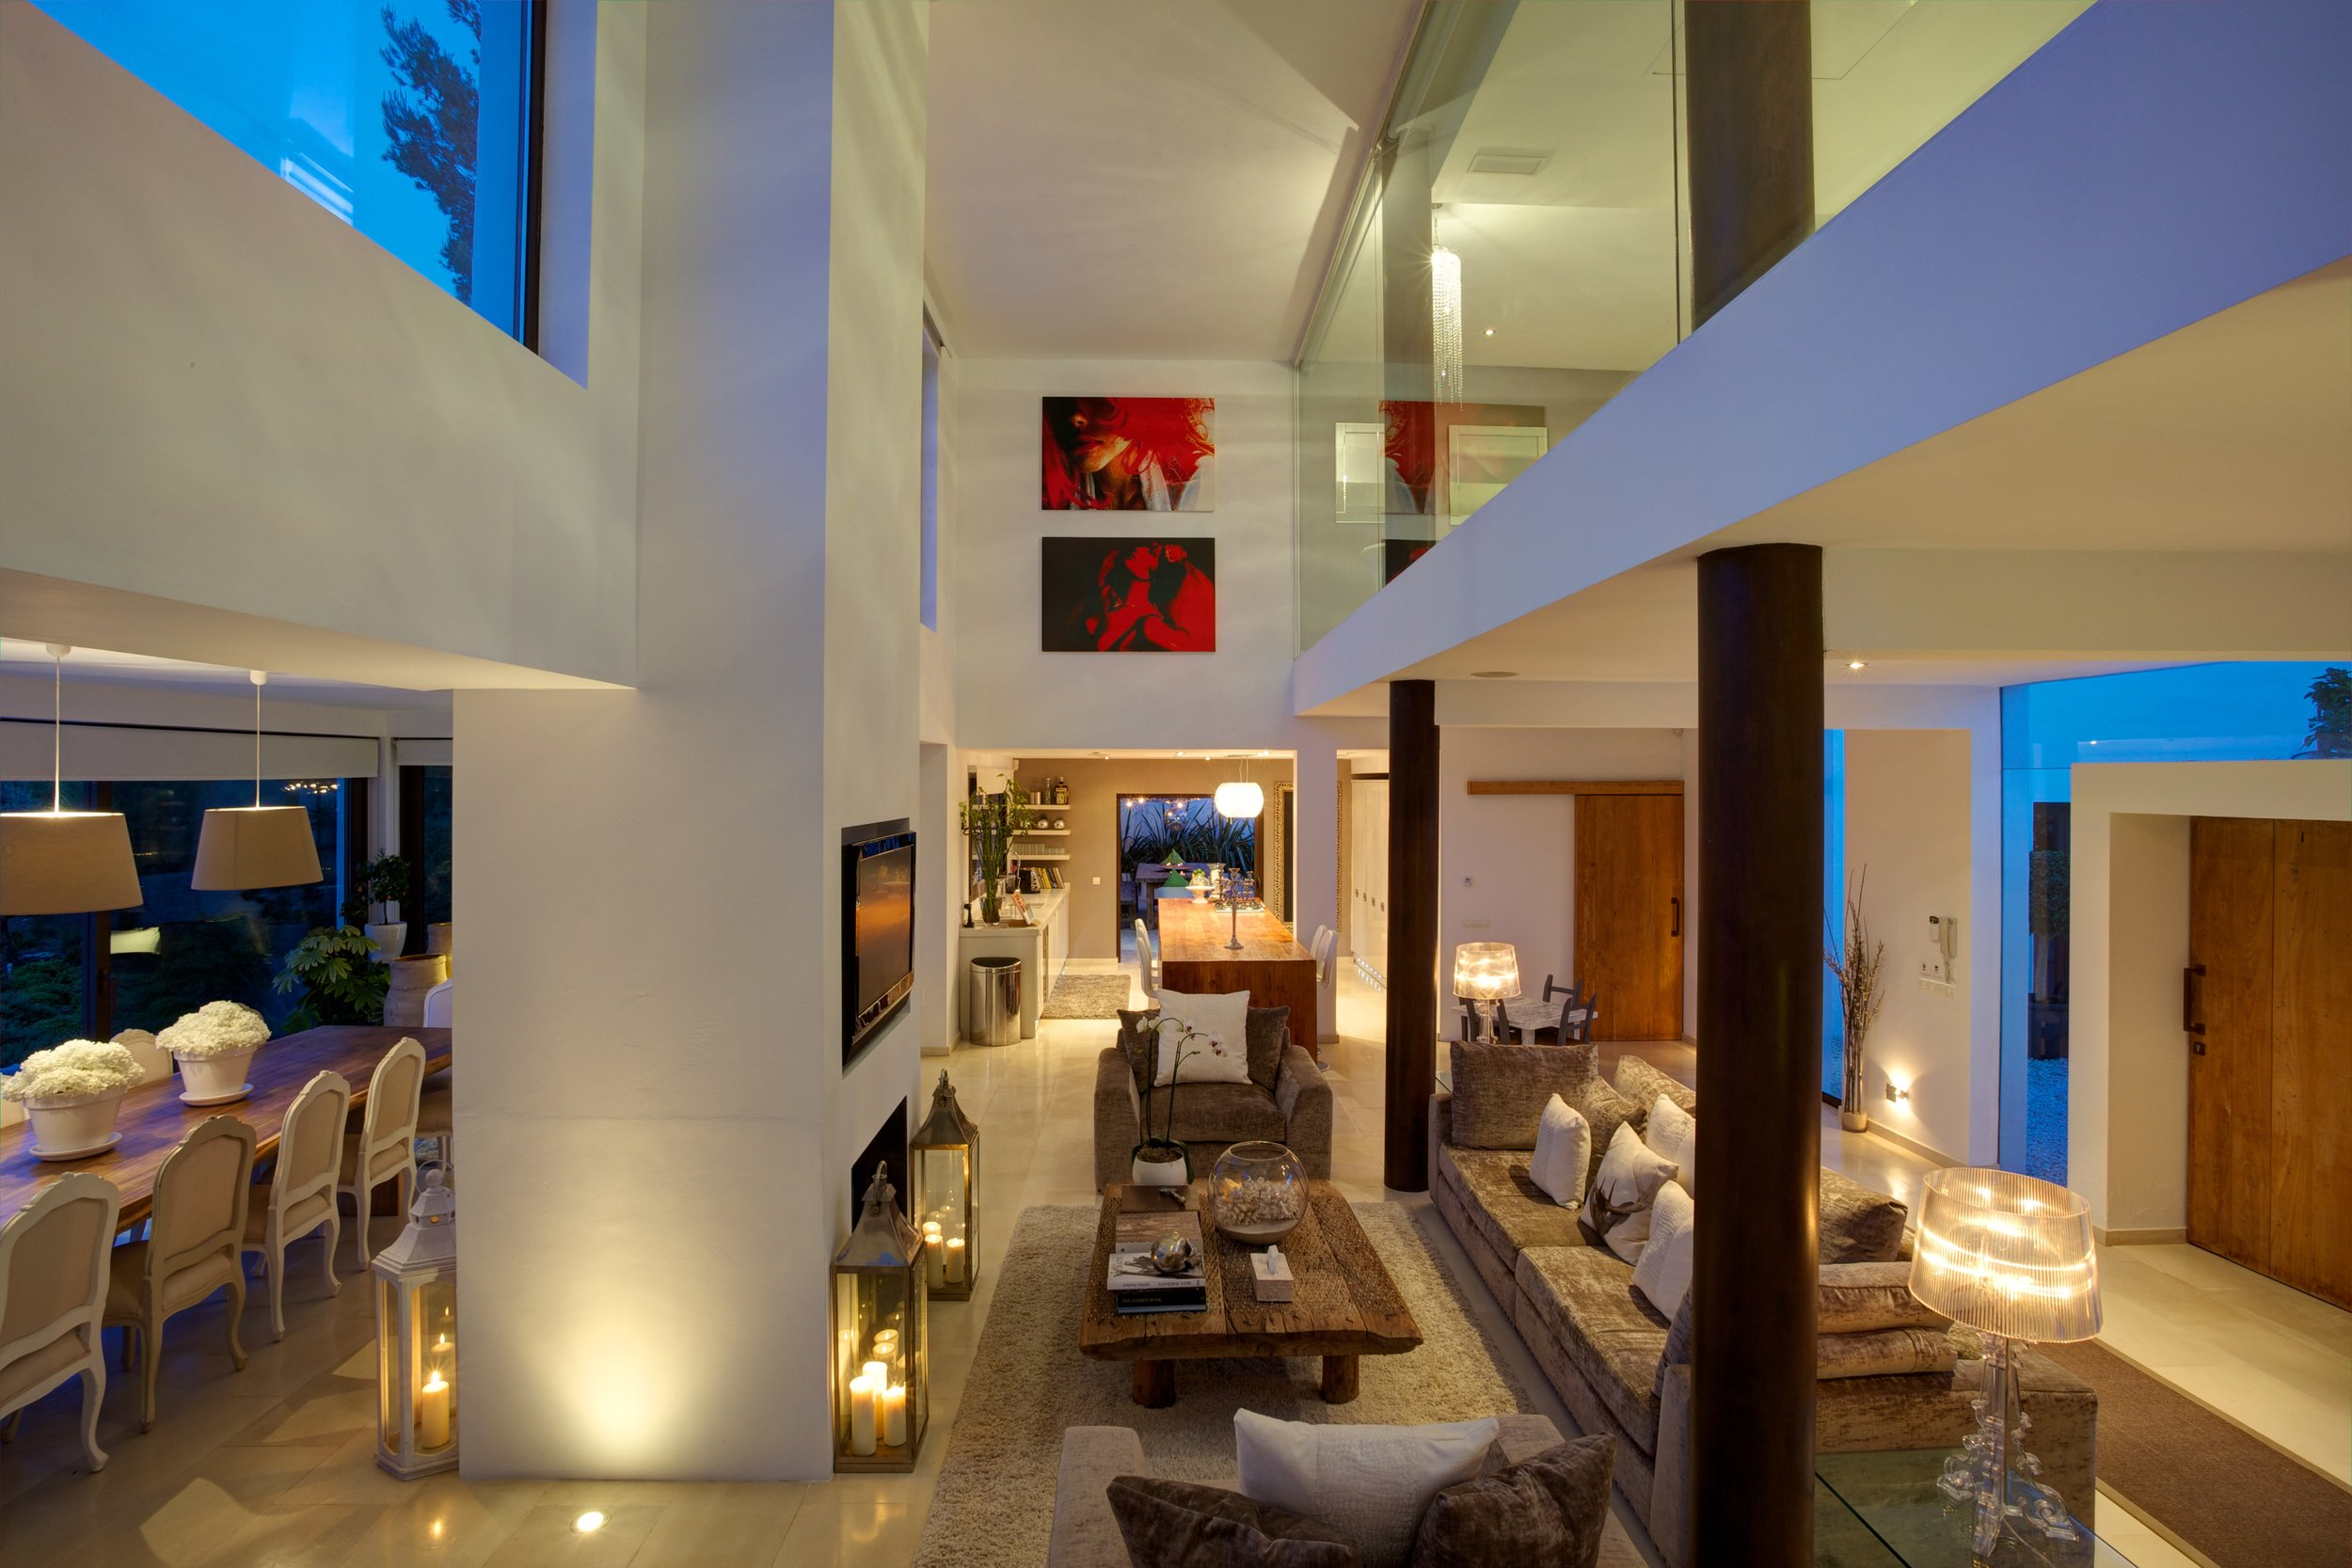 Living area by night .jpg